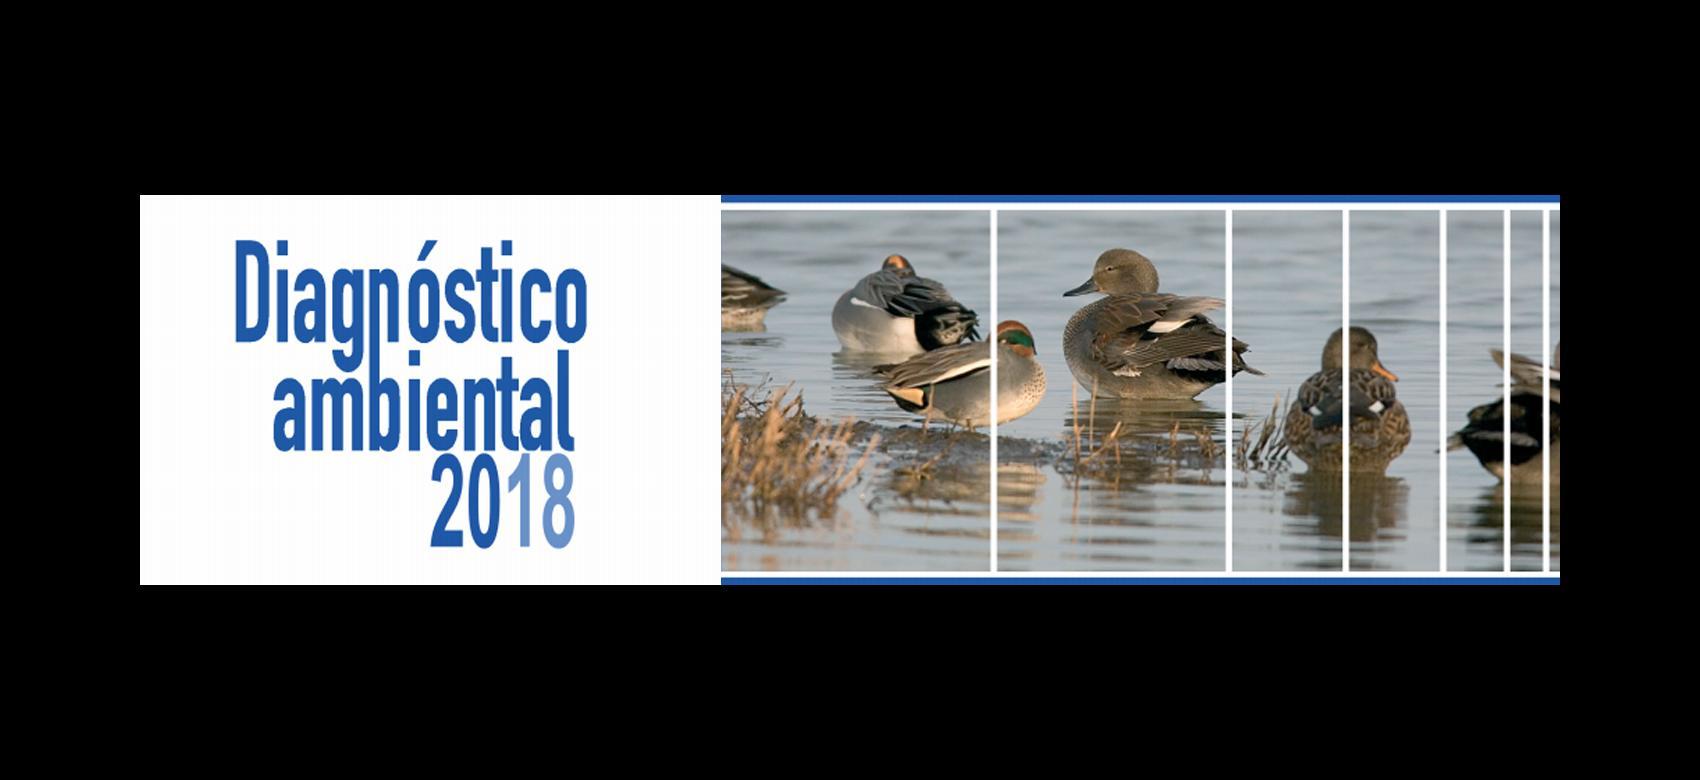 Diagnóstico ambiental 2018